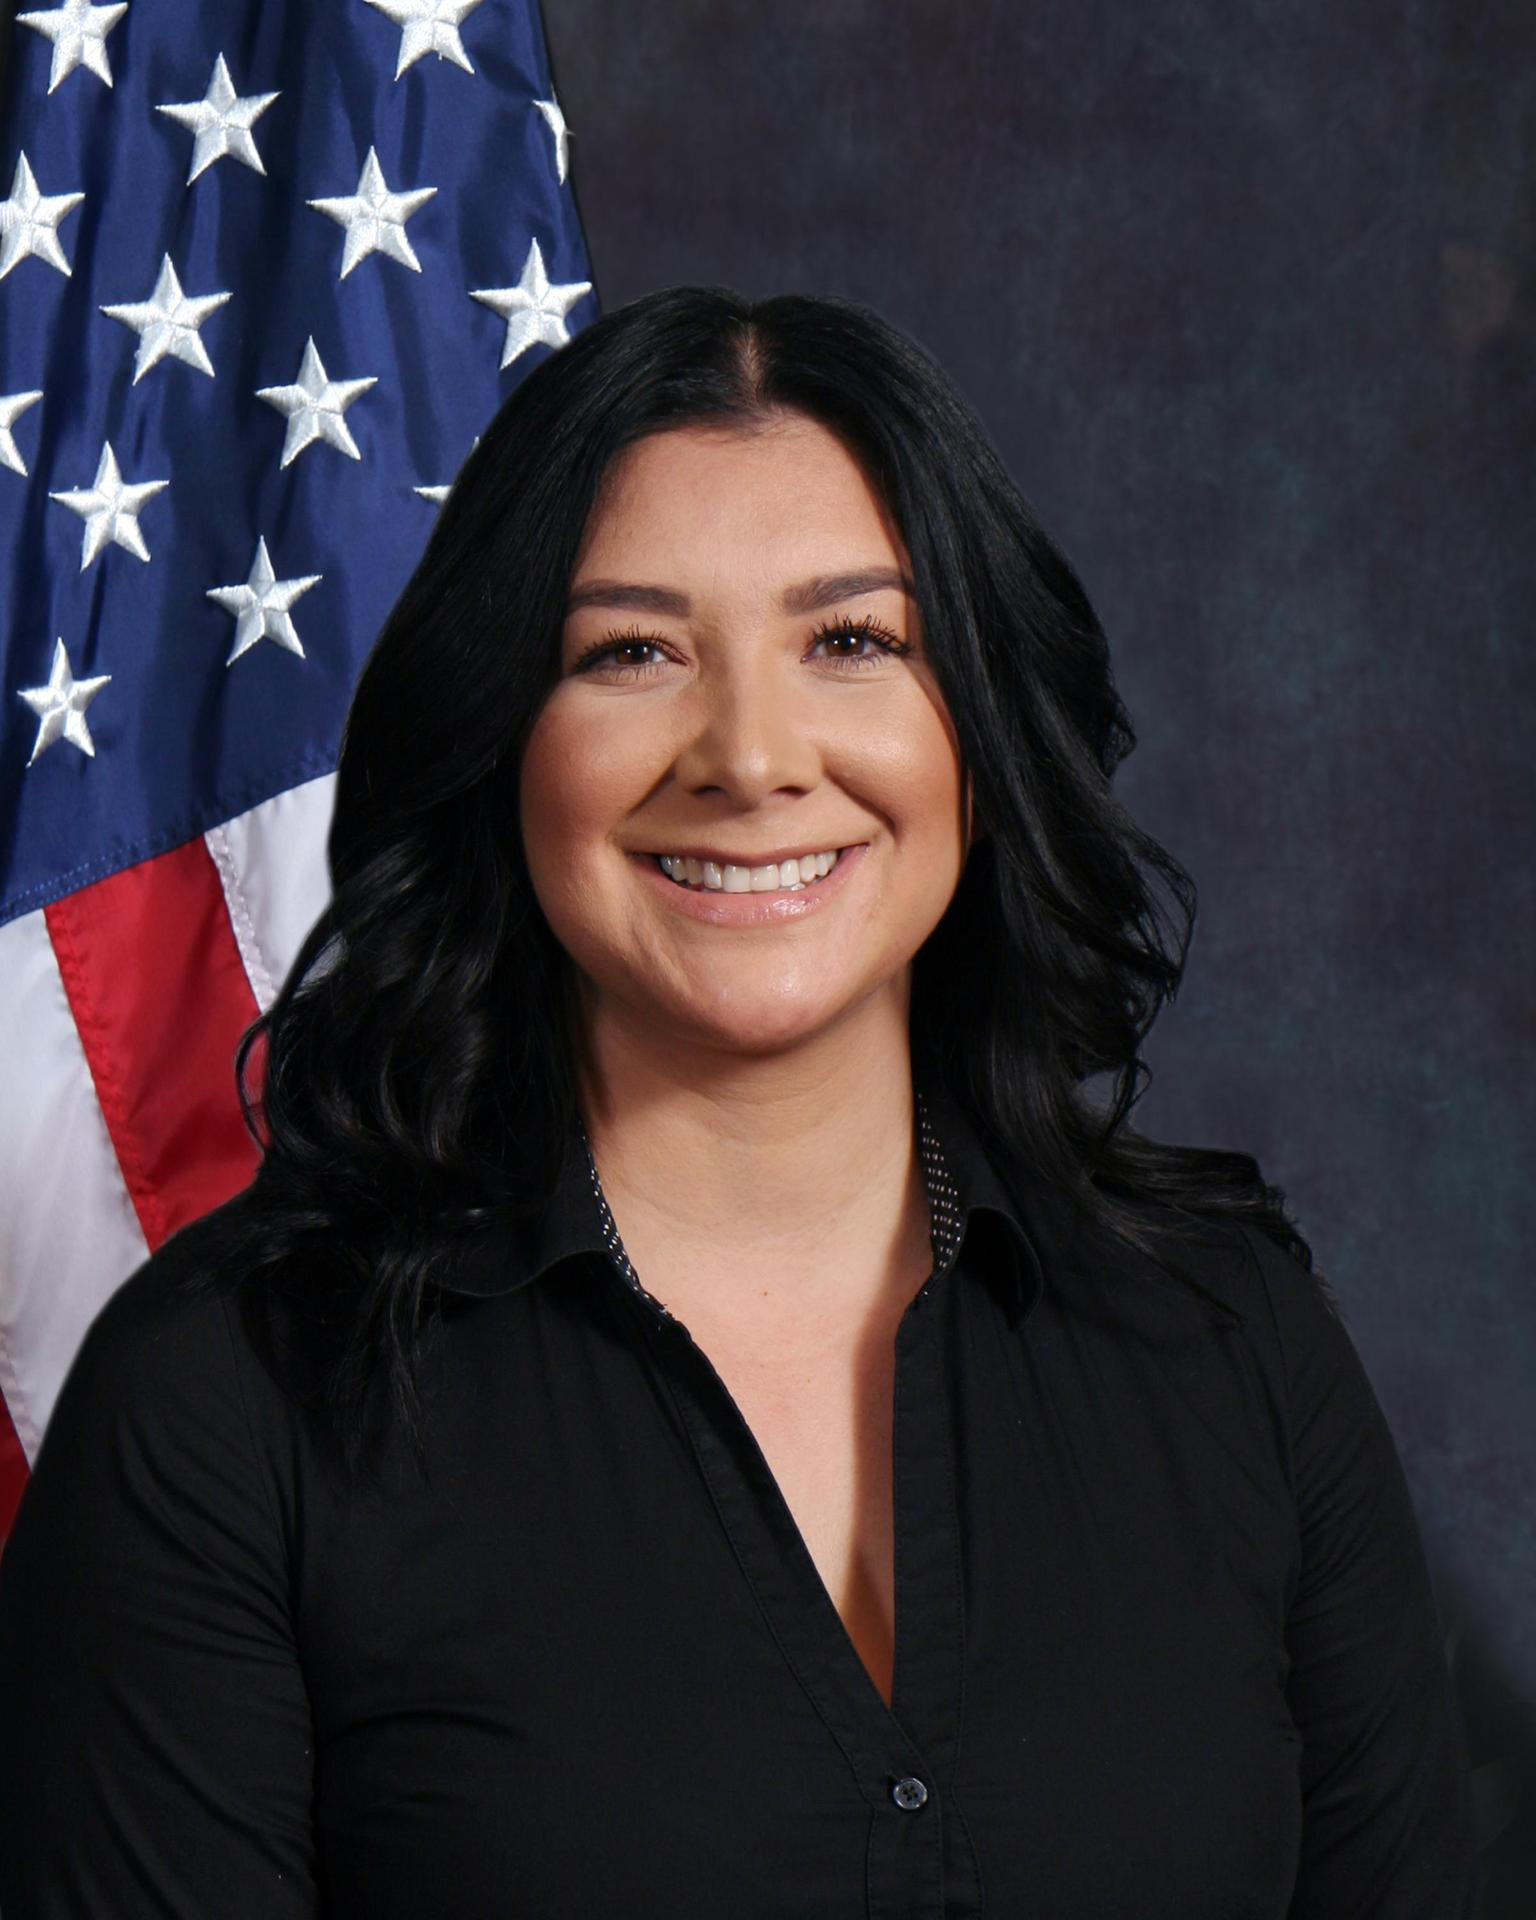 Picture of Commissioner Perez